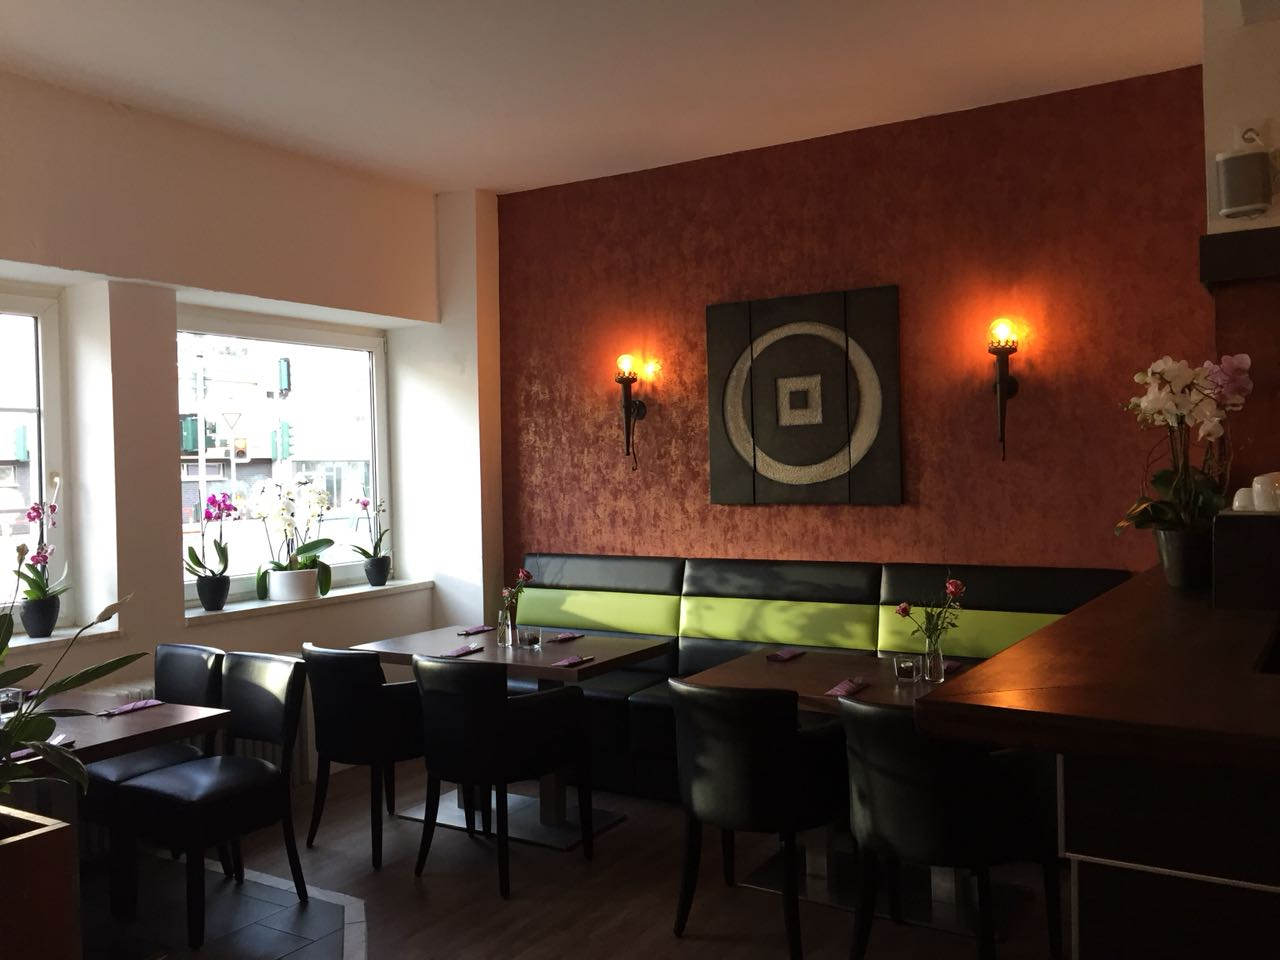 ffnungszeiten pikant restaurant k lner landstra e 409. Black Bedroom Furniture Sets. Home Design Ideas